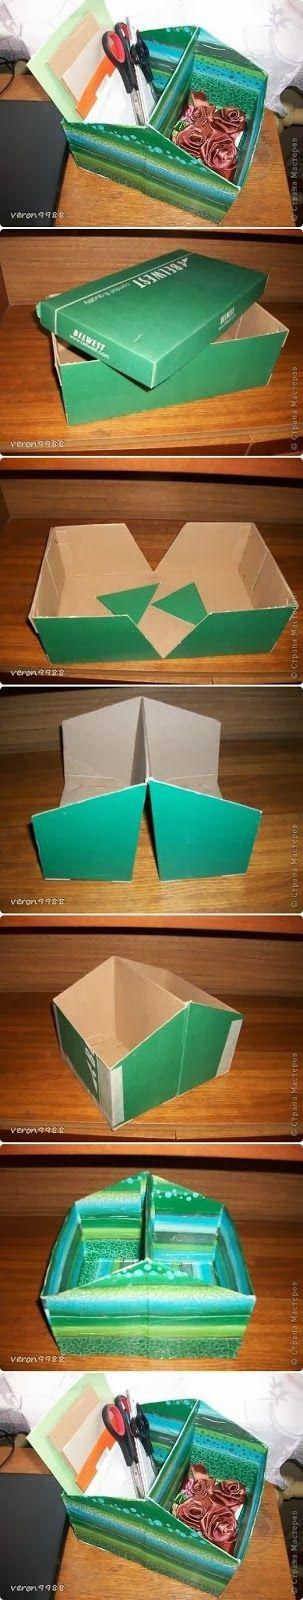 DIY Craft Storage Bo